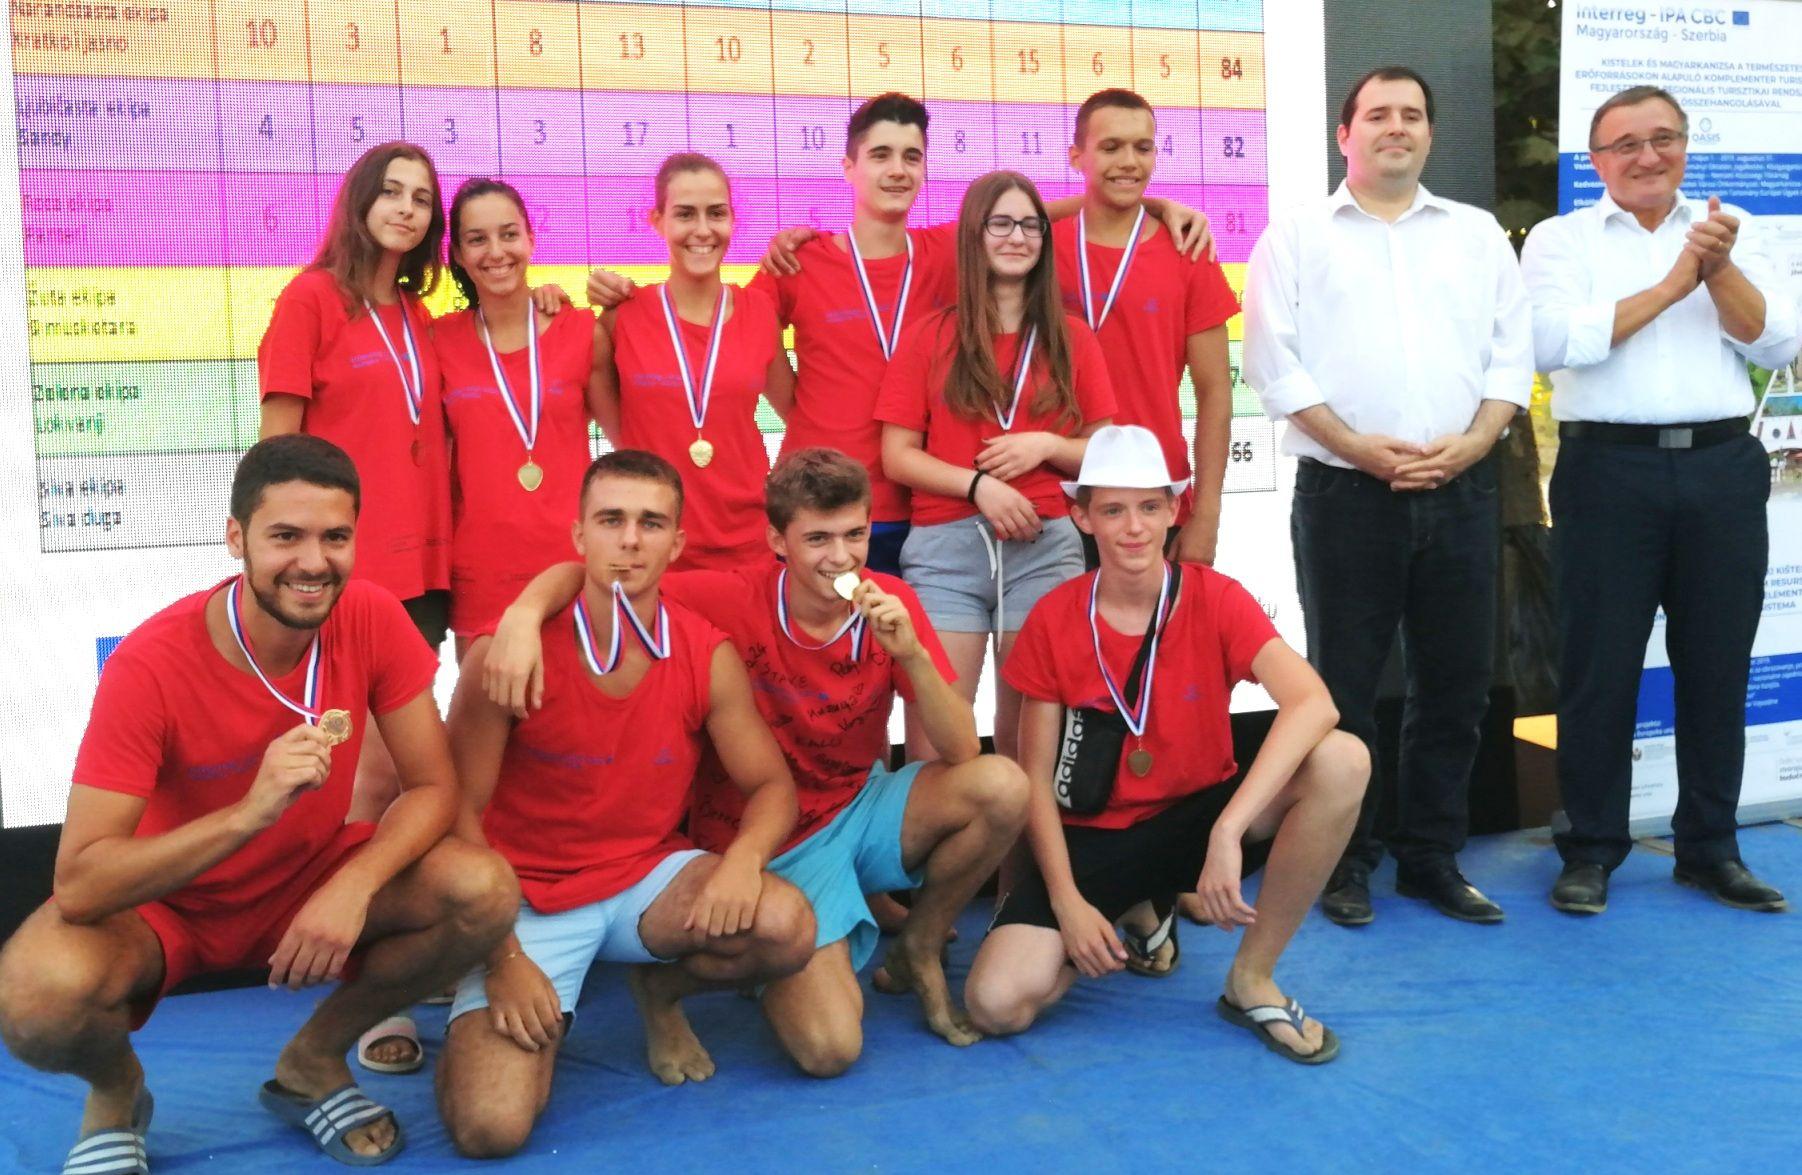 Kamp OASIS pobednici Red star